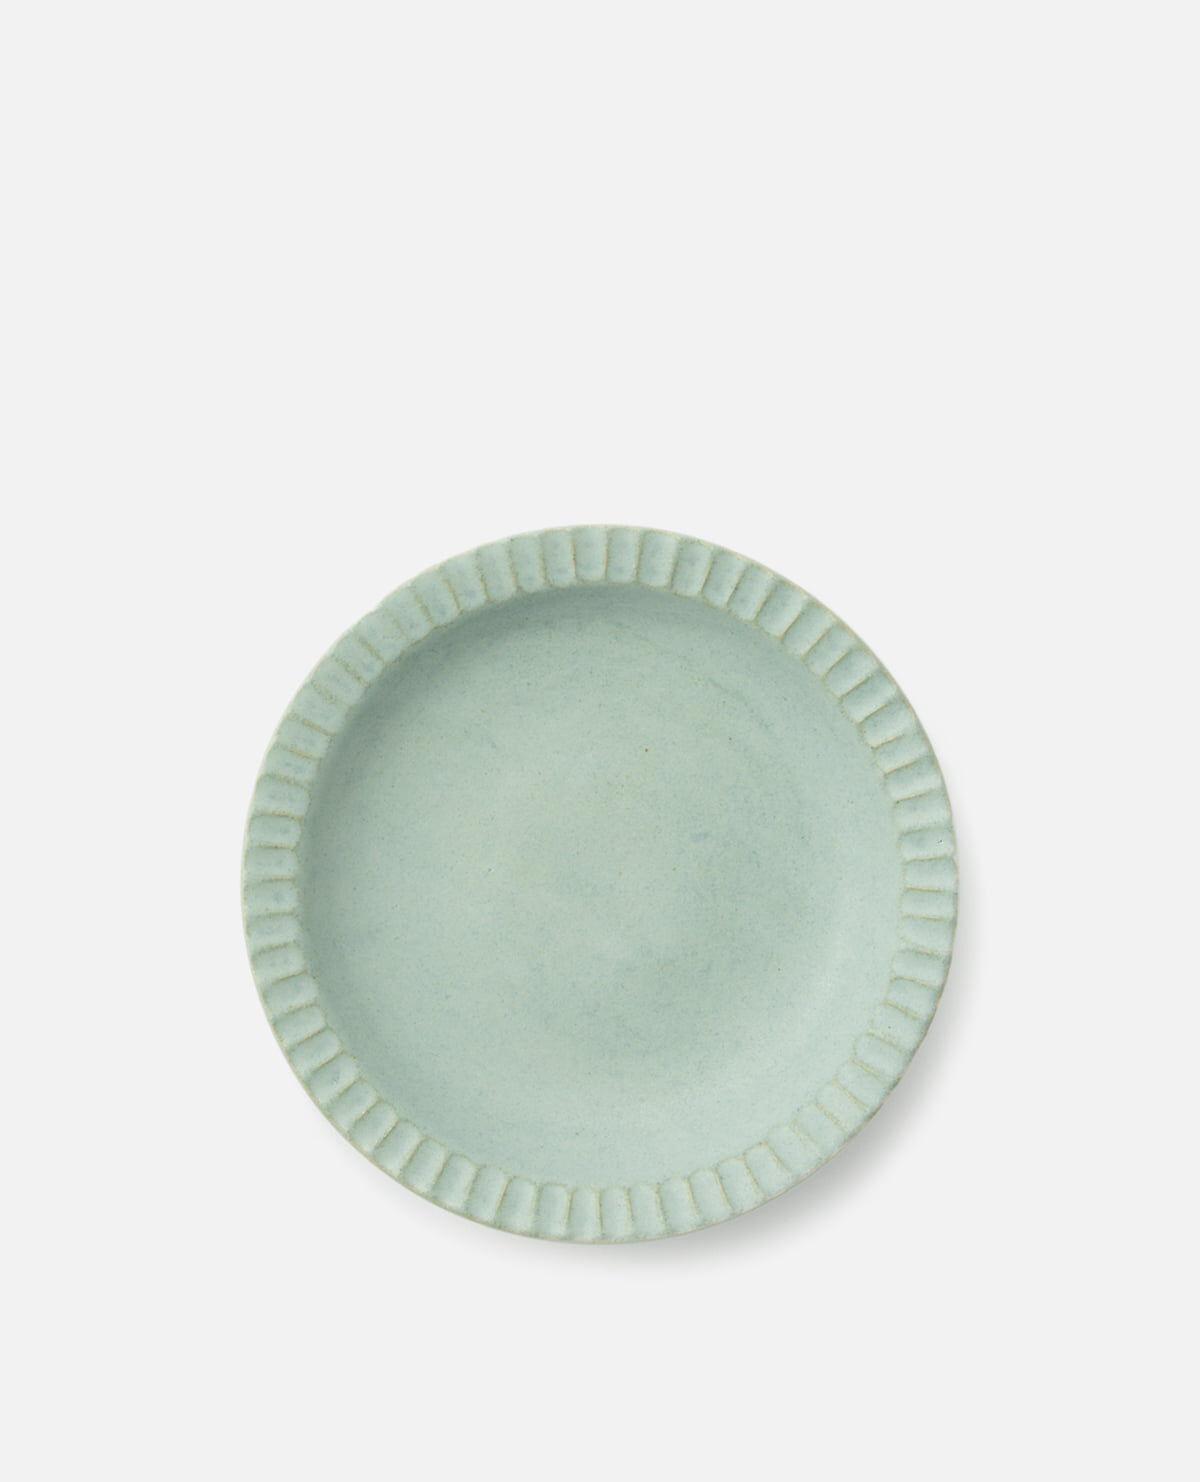 PELICAN PLATE(プレート ブルー ホワイト)